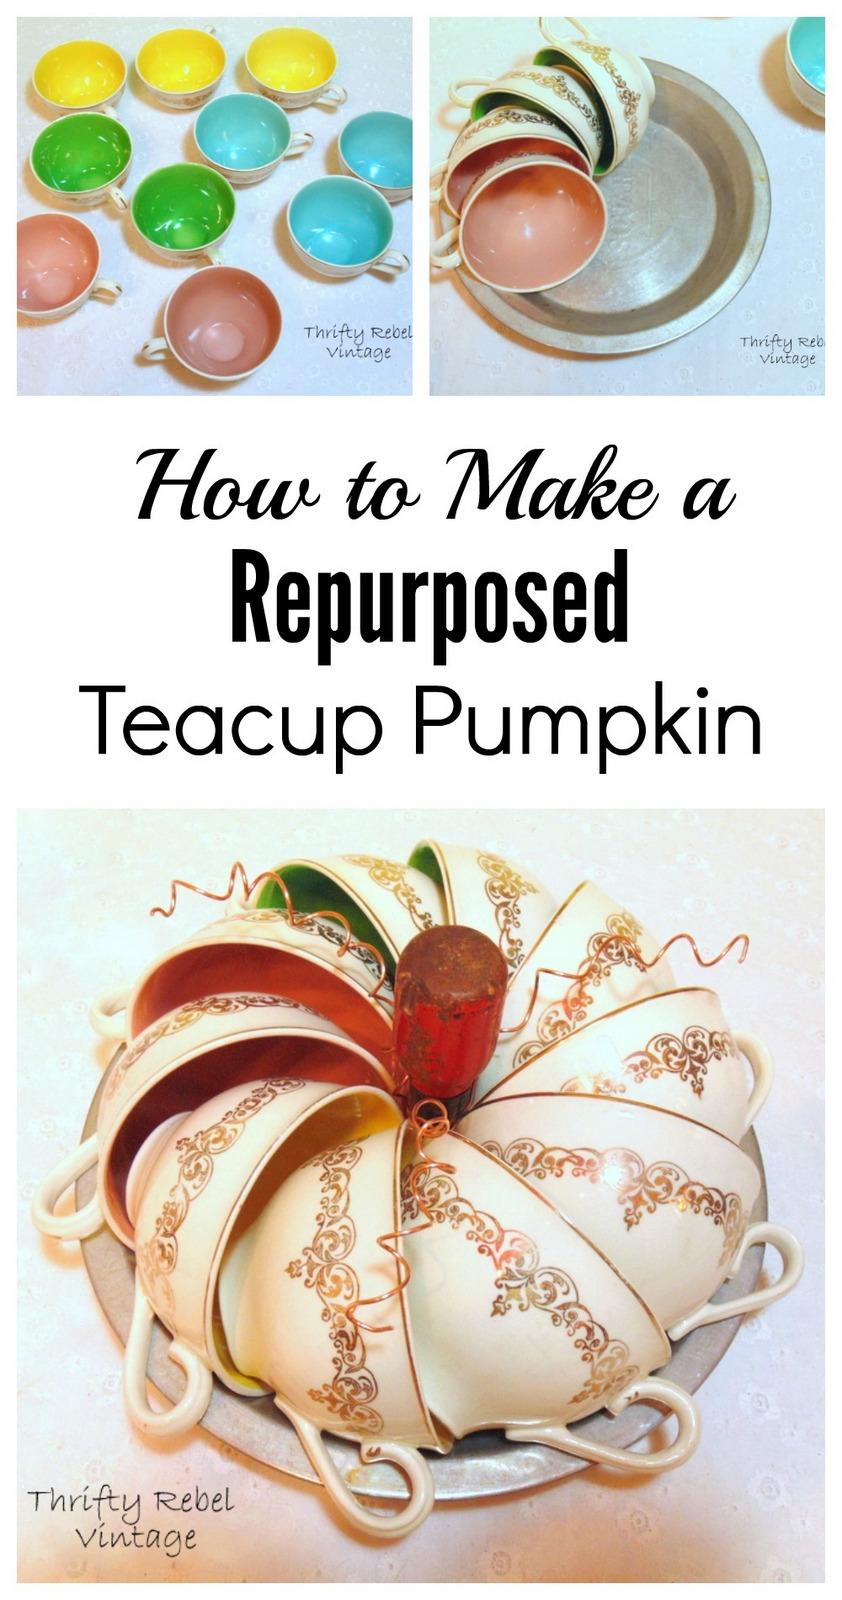 How to make a repurposed teacup pumpkin